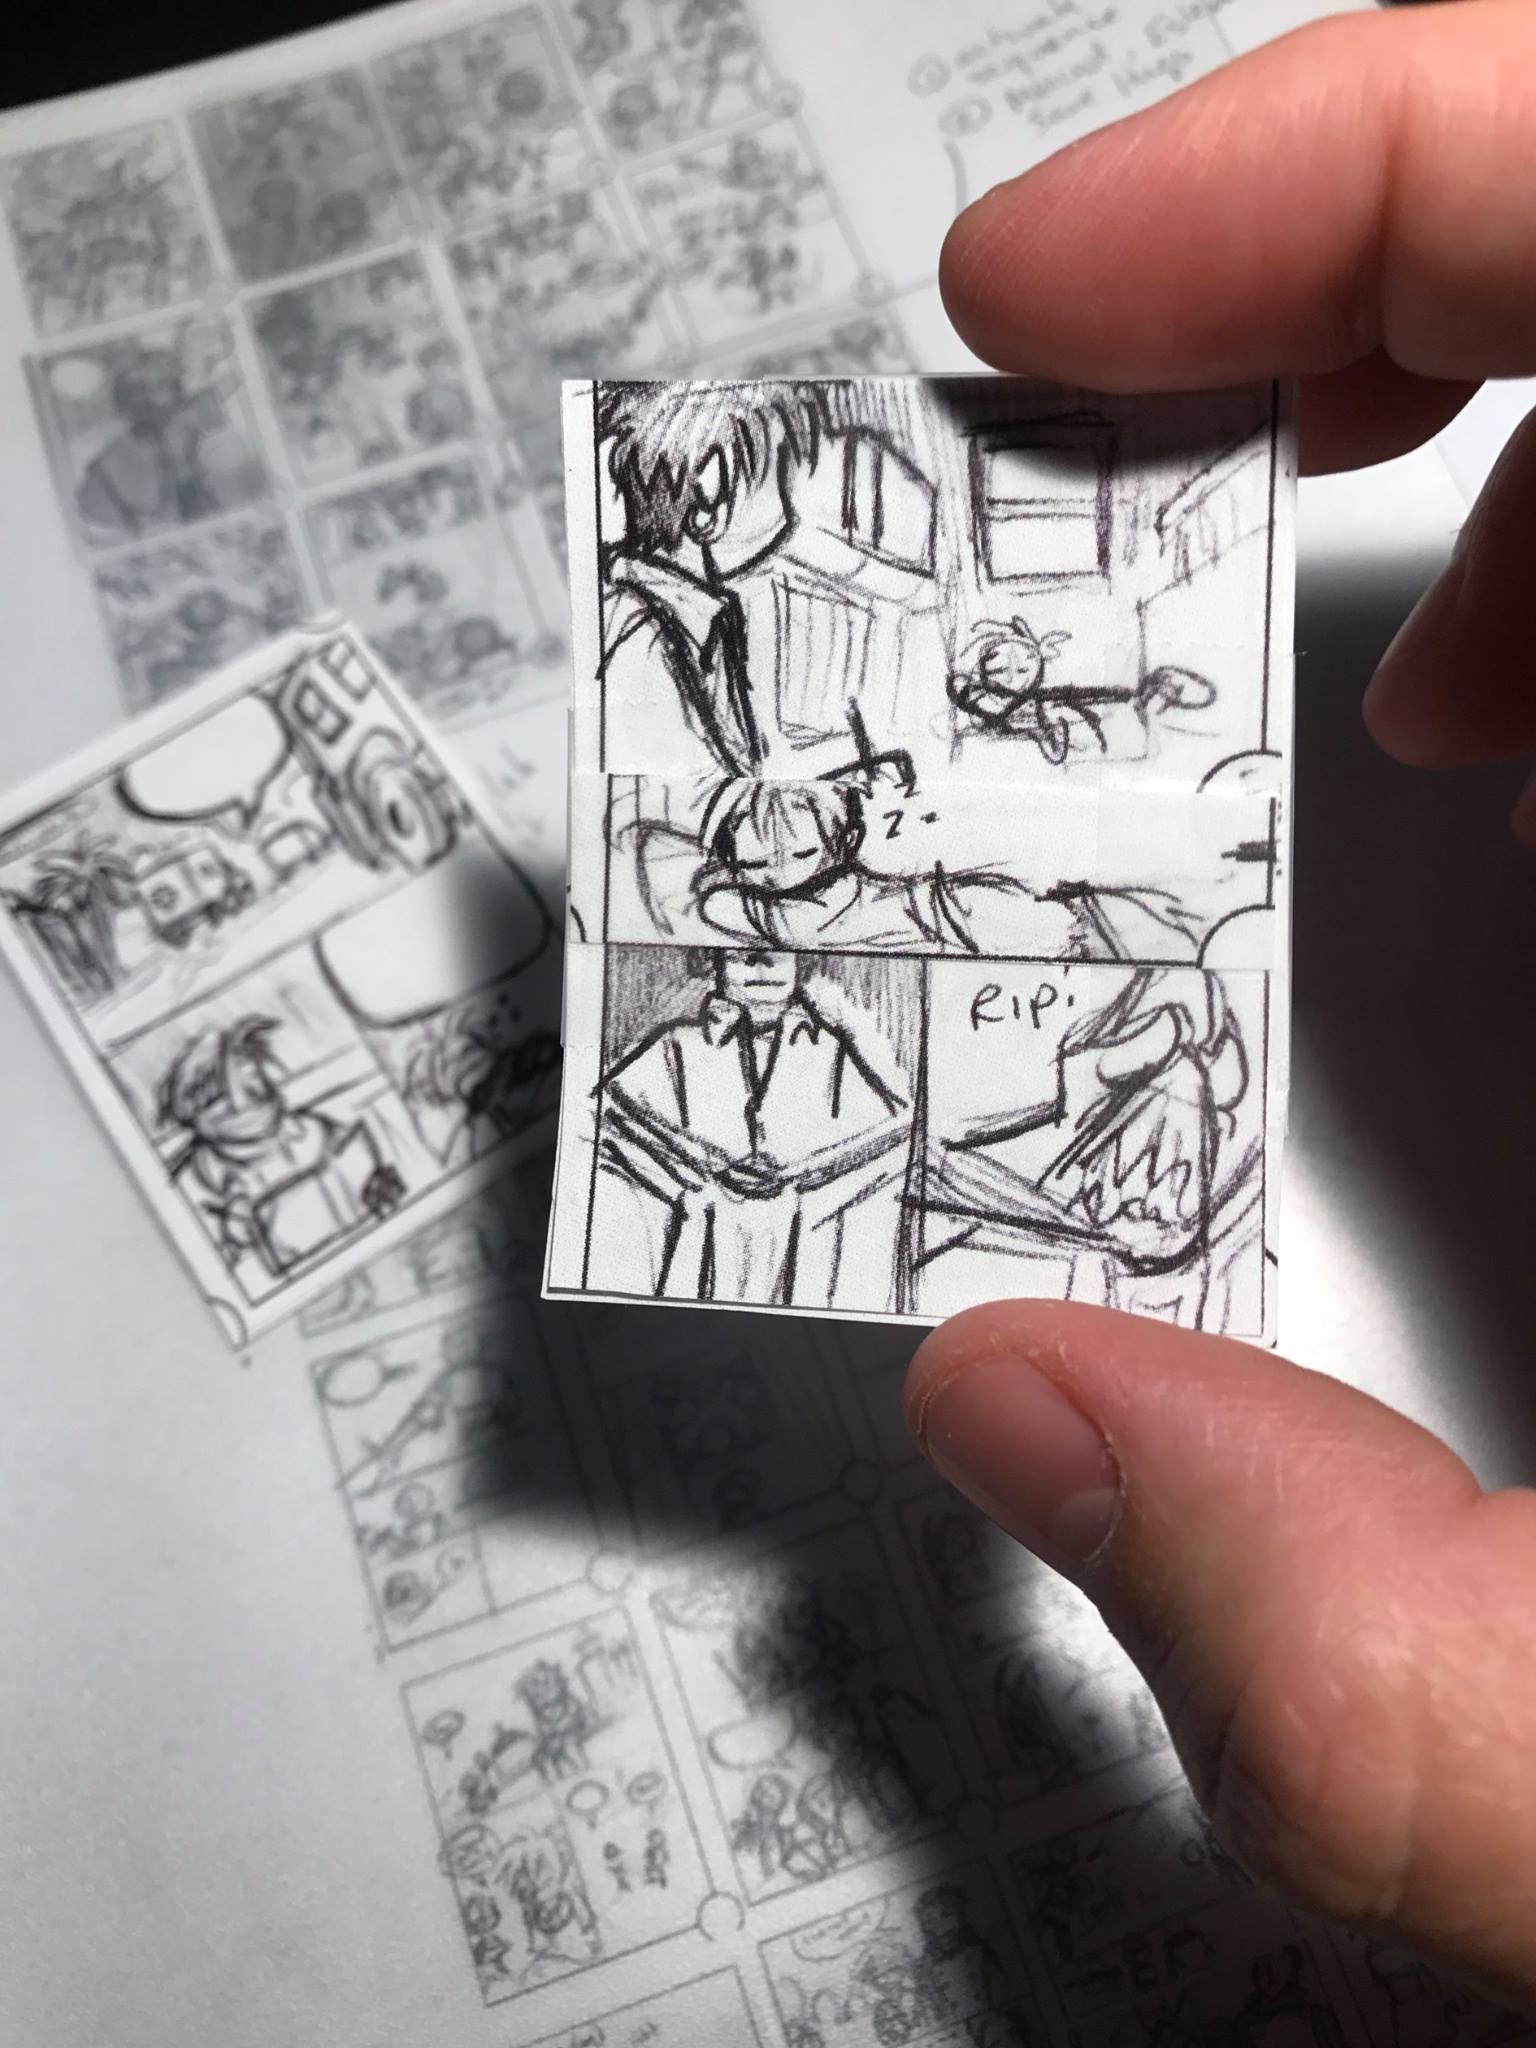 Thumbnail comic layouts by Chris Moujaes.